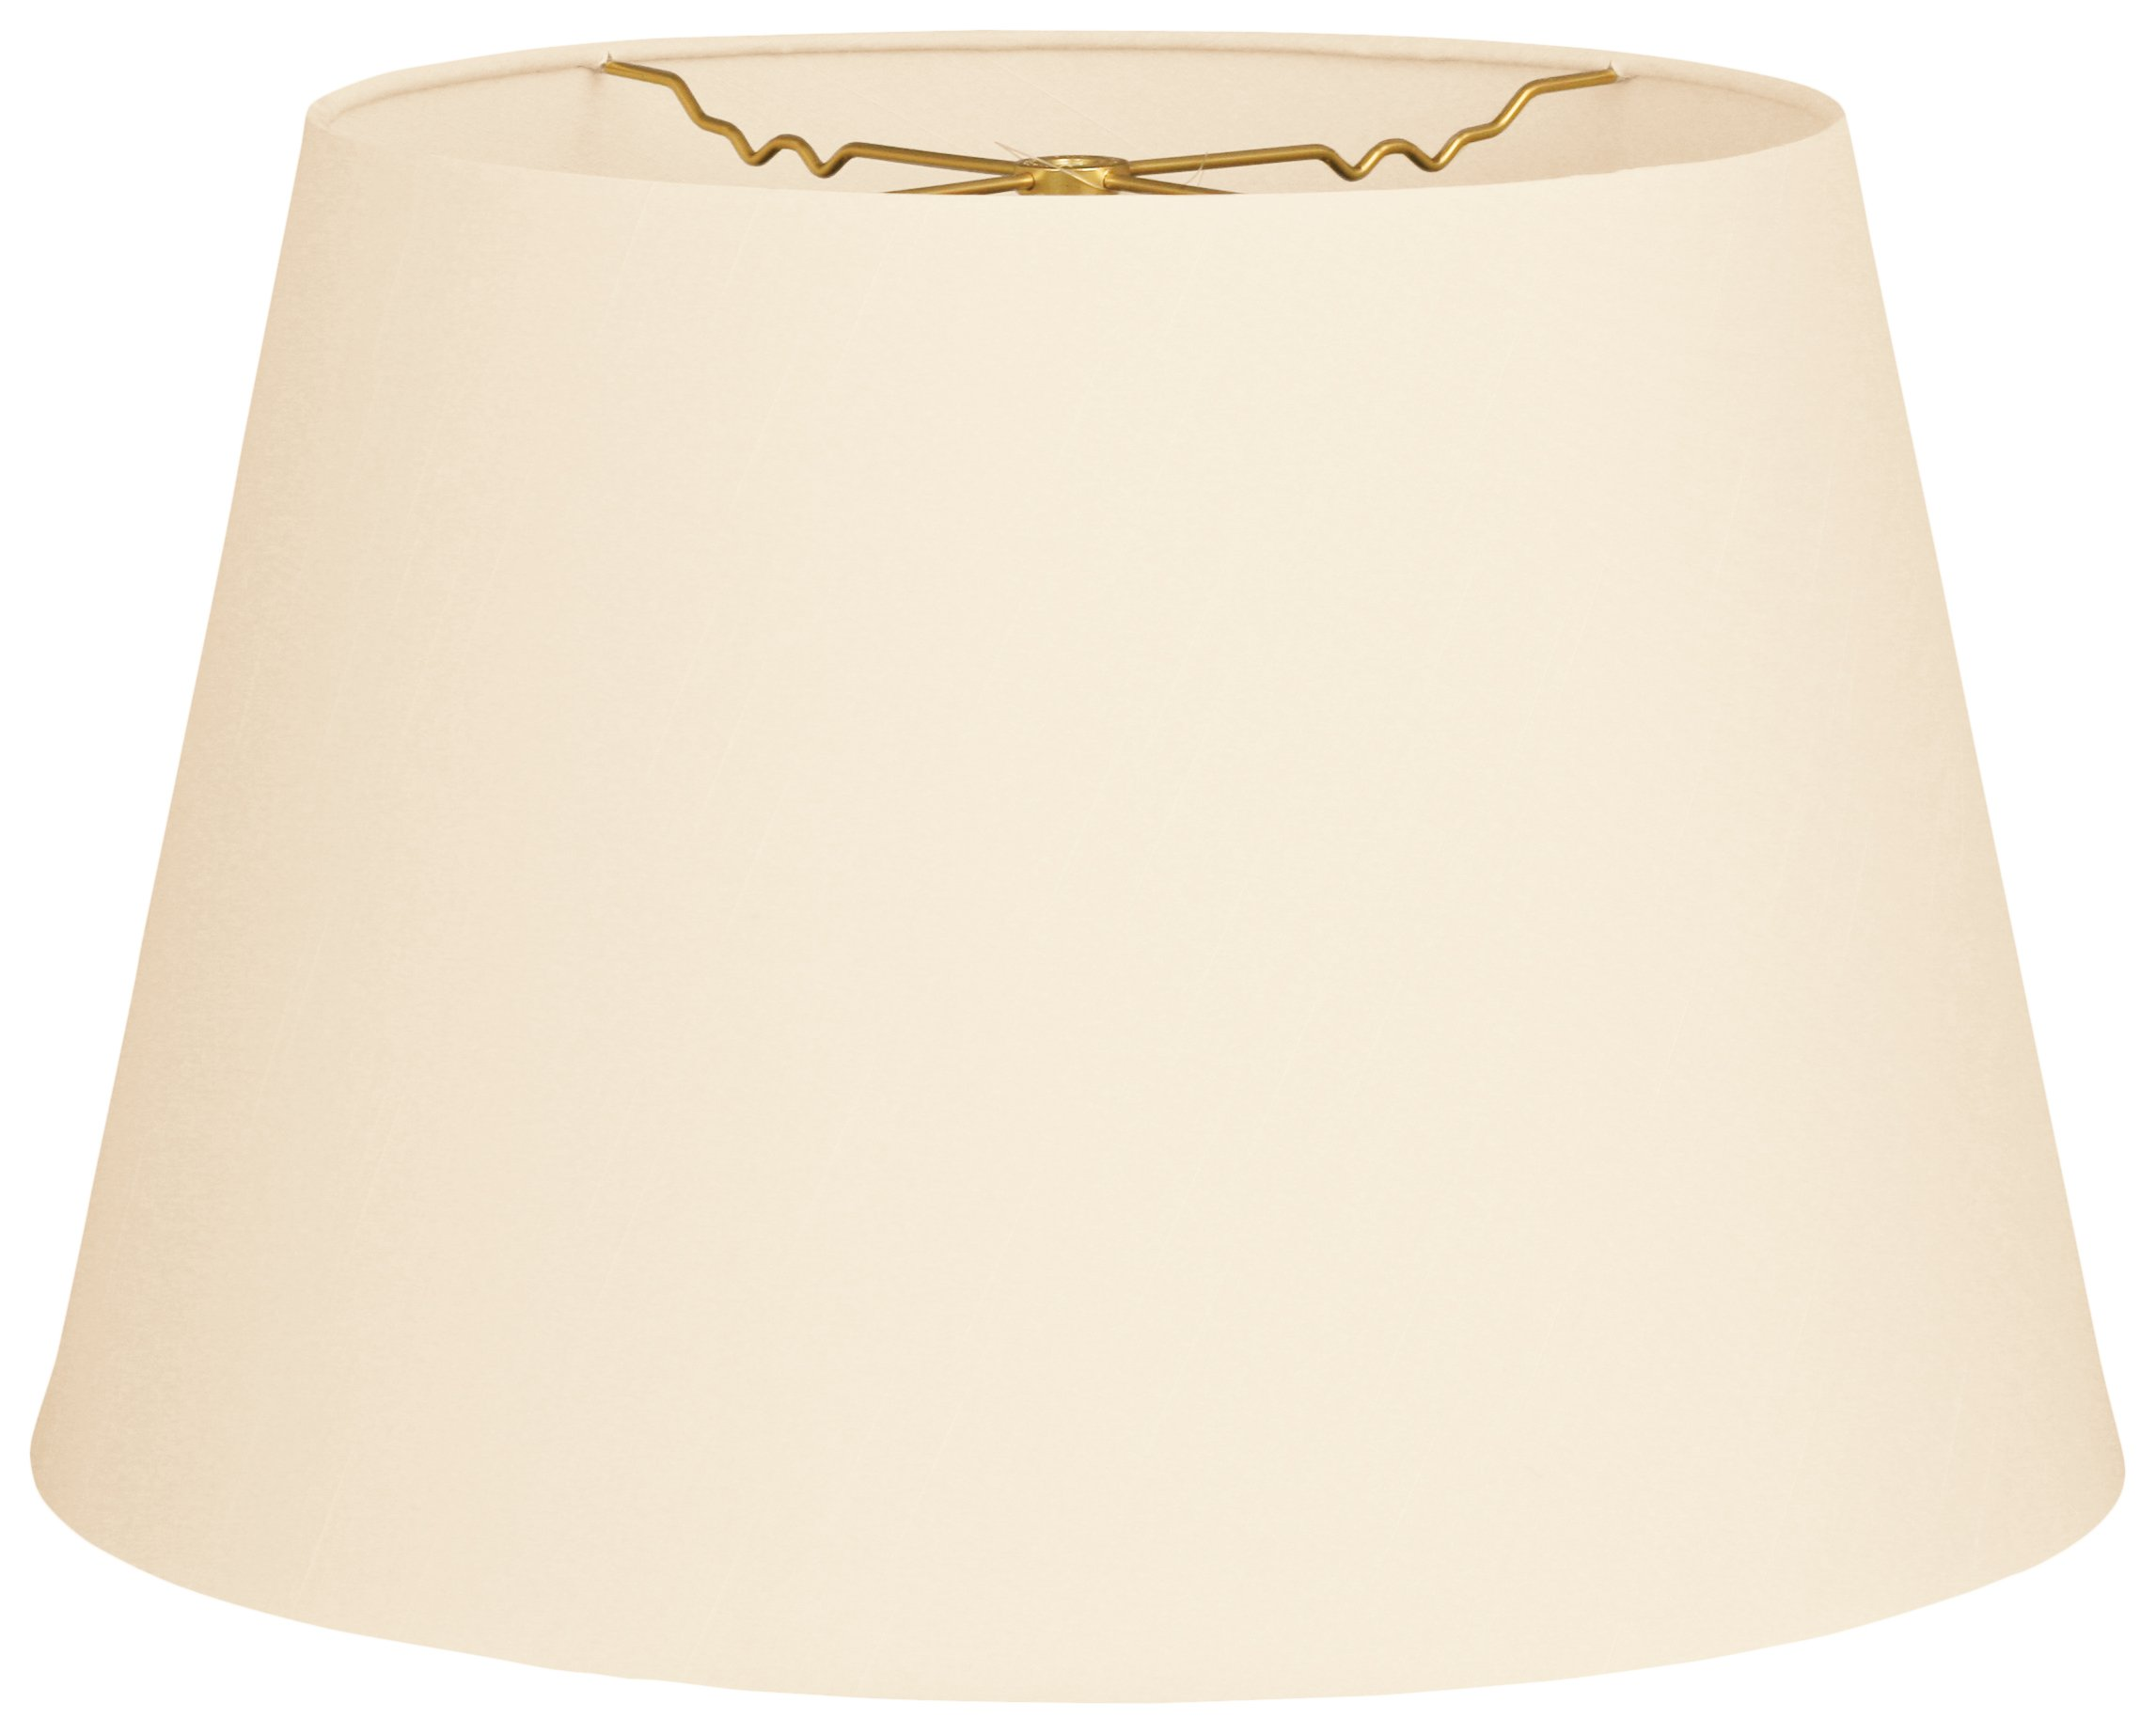 Royal Designs HB-606-20EG Tapered Shallow Drum Hardback Lamp Shade, Eggshell, 14 x 20 x 13